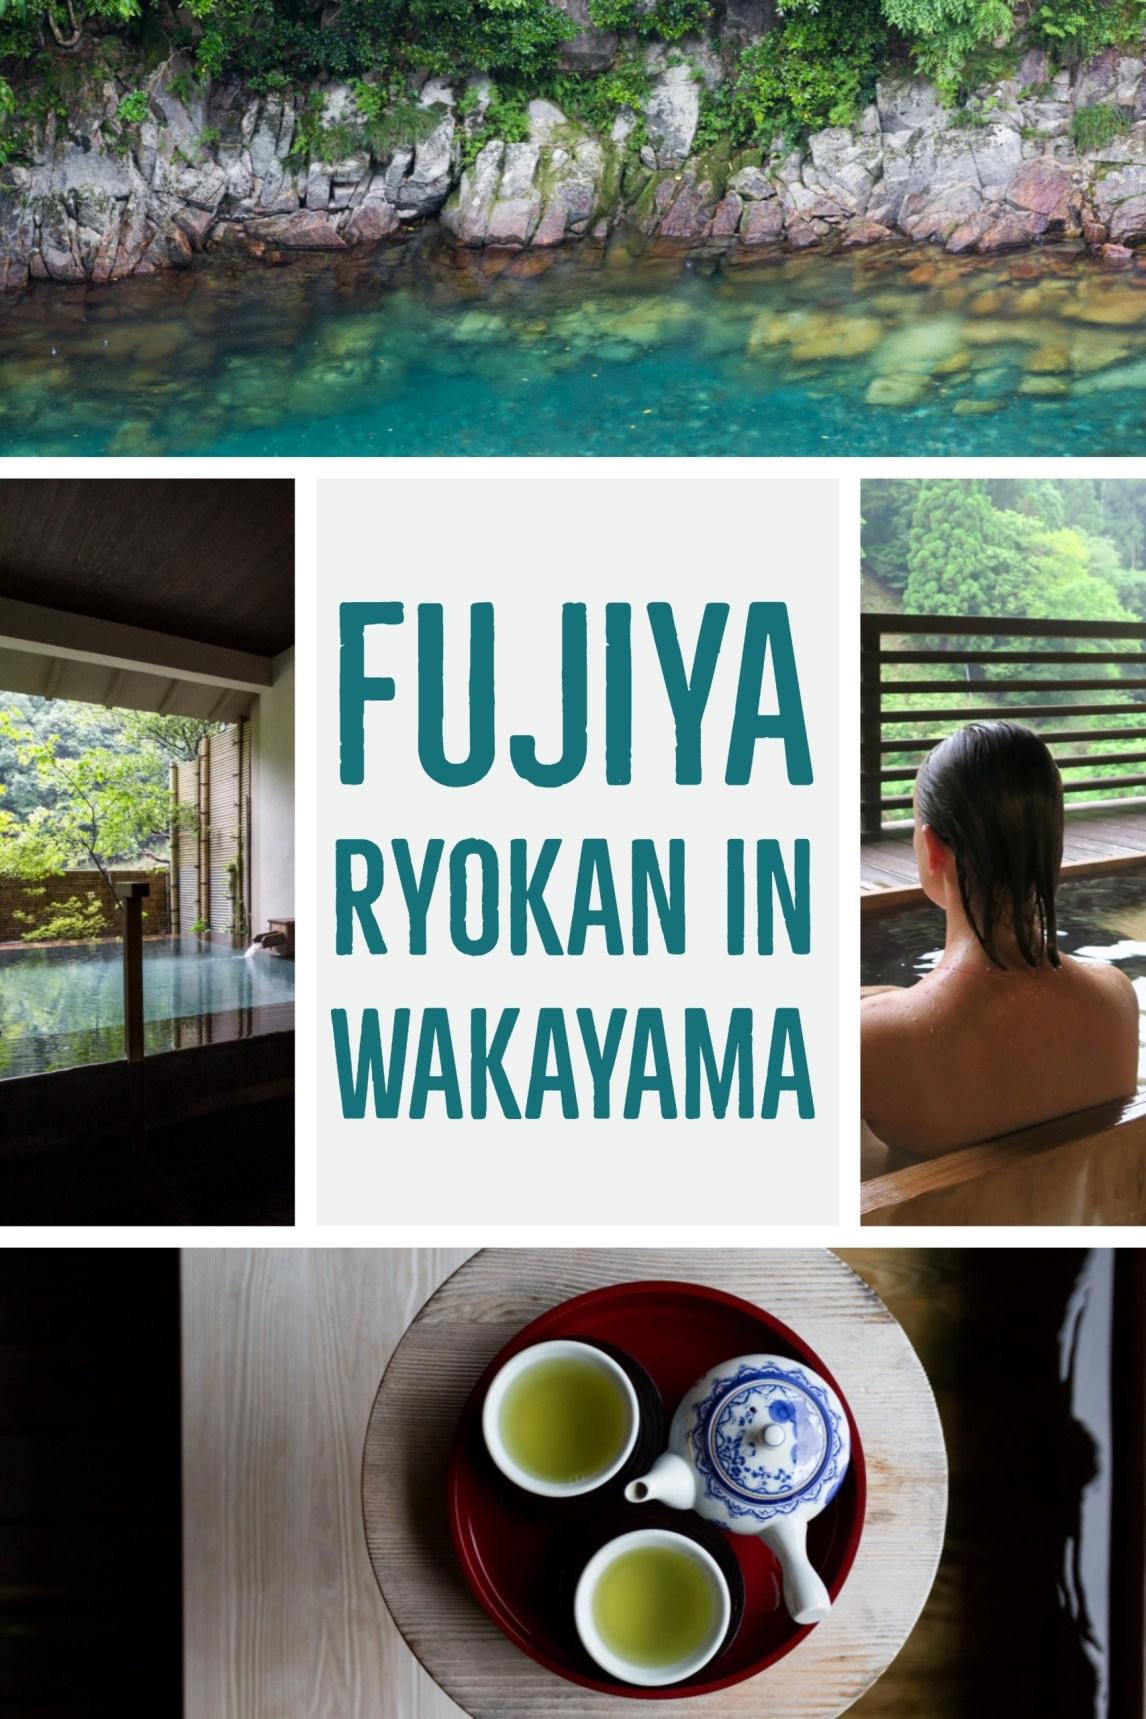 FujiyaRyokanWakayama